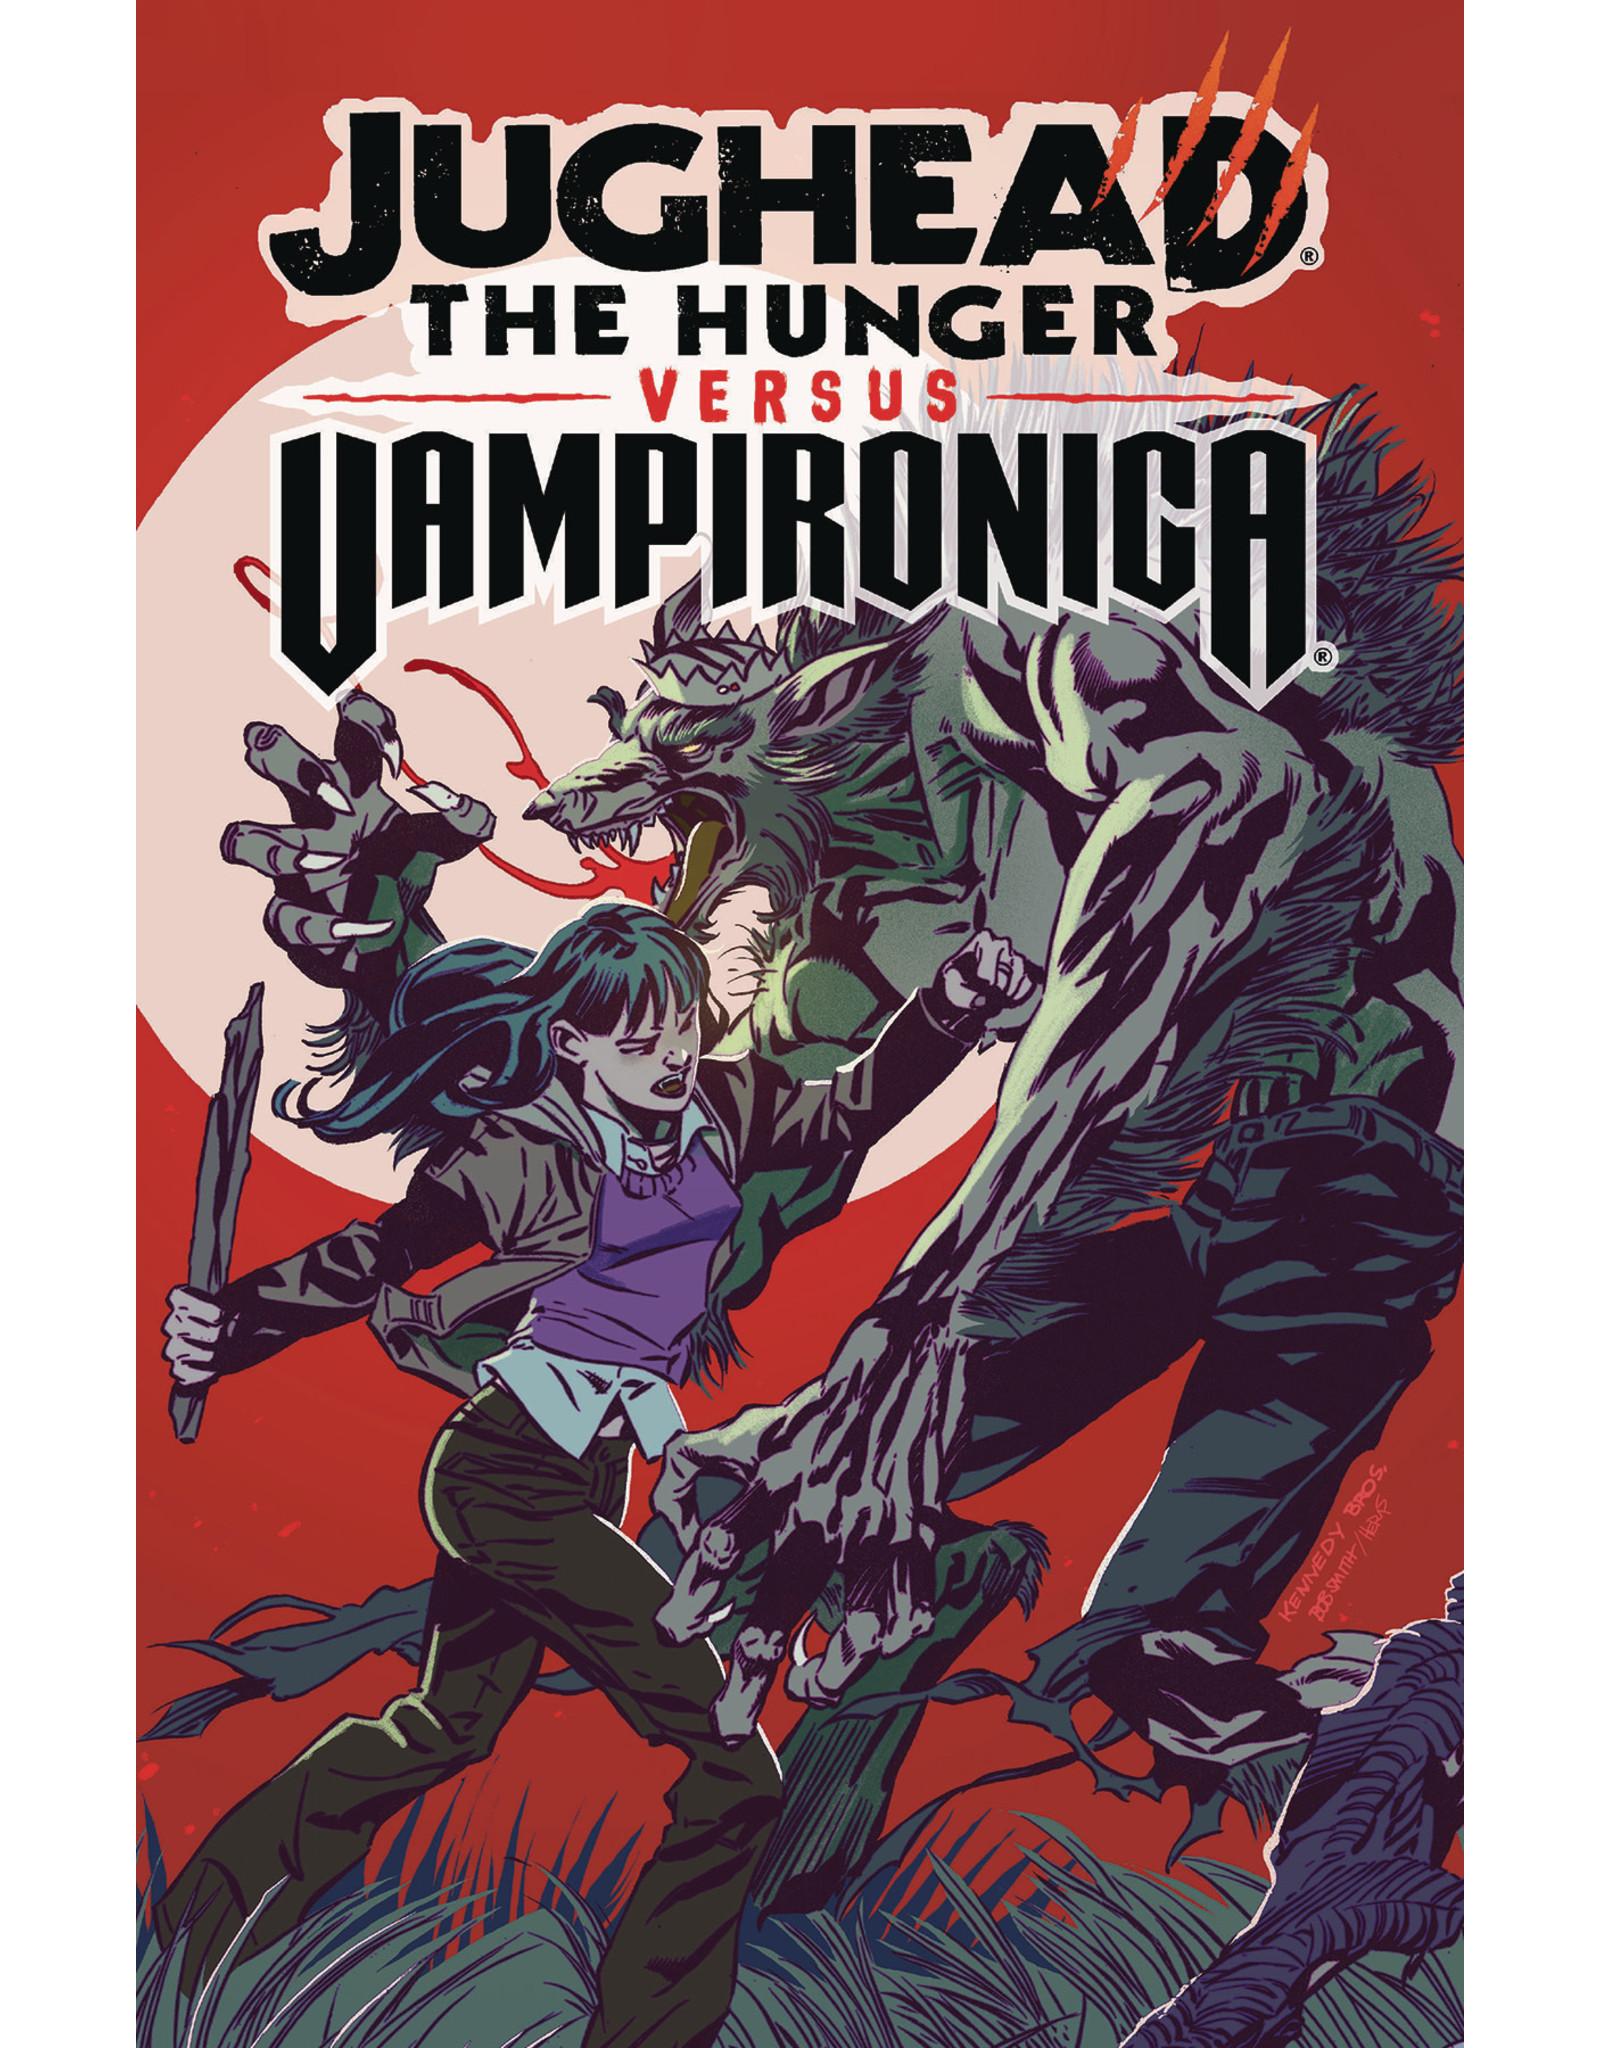 ARCHIE COMIC PUBLICATIONS JUGHEAD HUNGER VS VAMPIRONICA TP